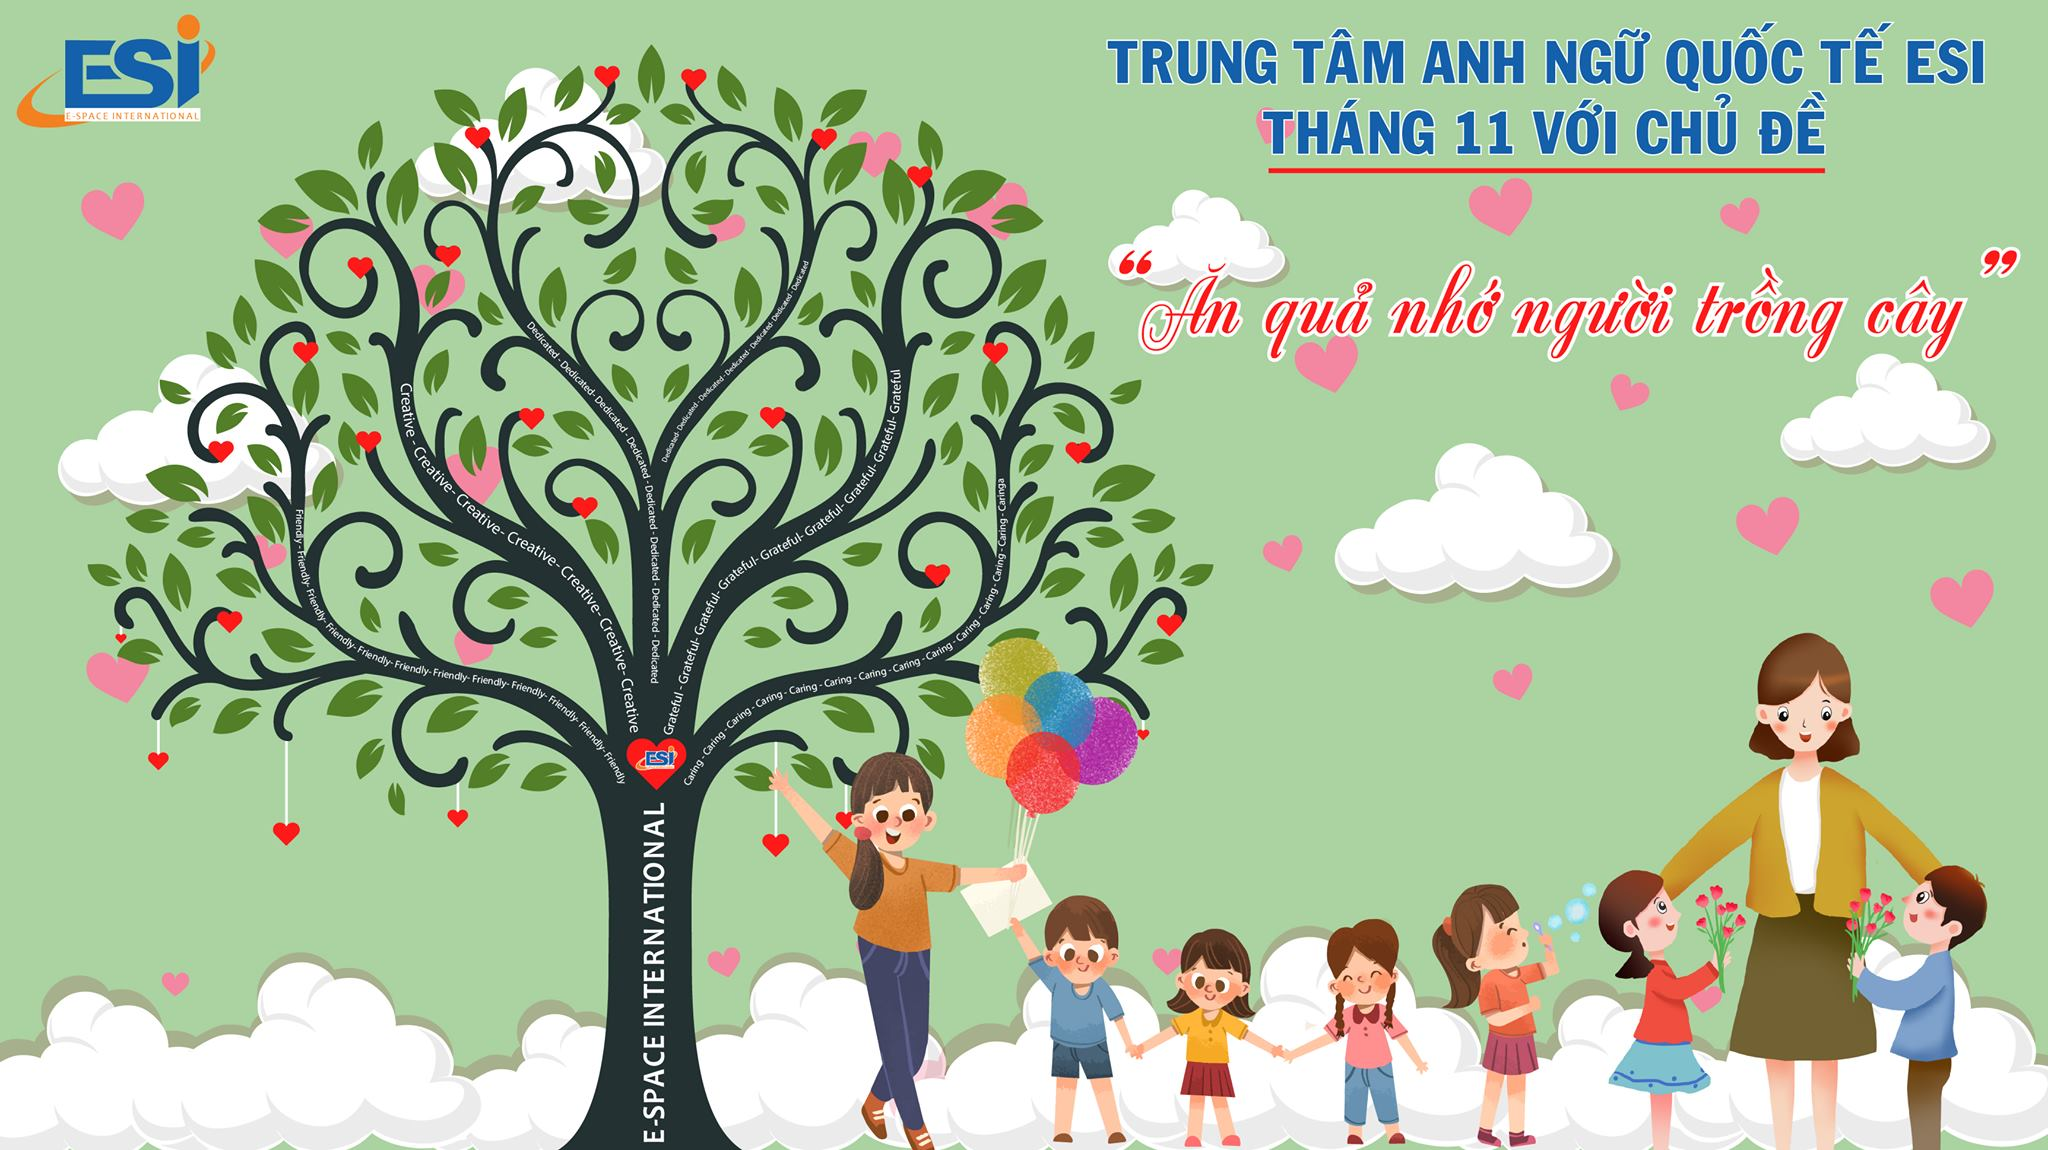 http://espace.com.vn/chuong-trinh-20/11-an-qua-nho-nguoi-trong-cay